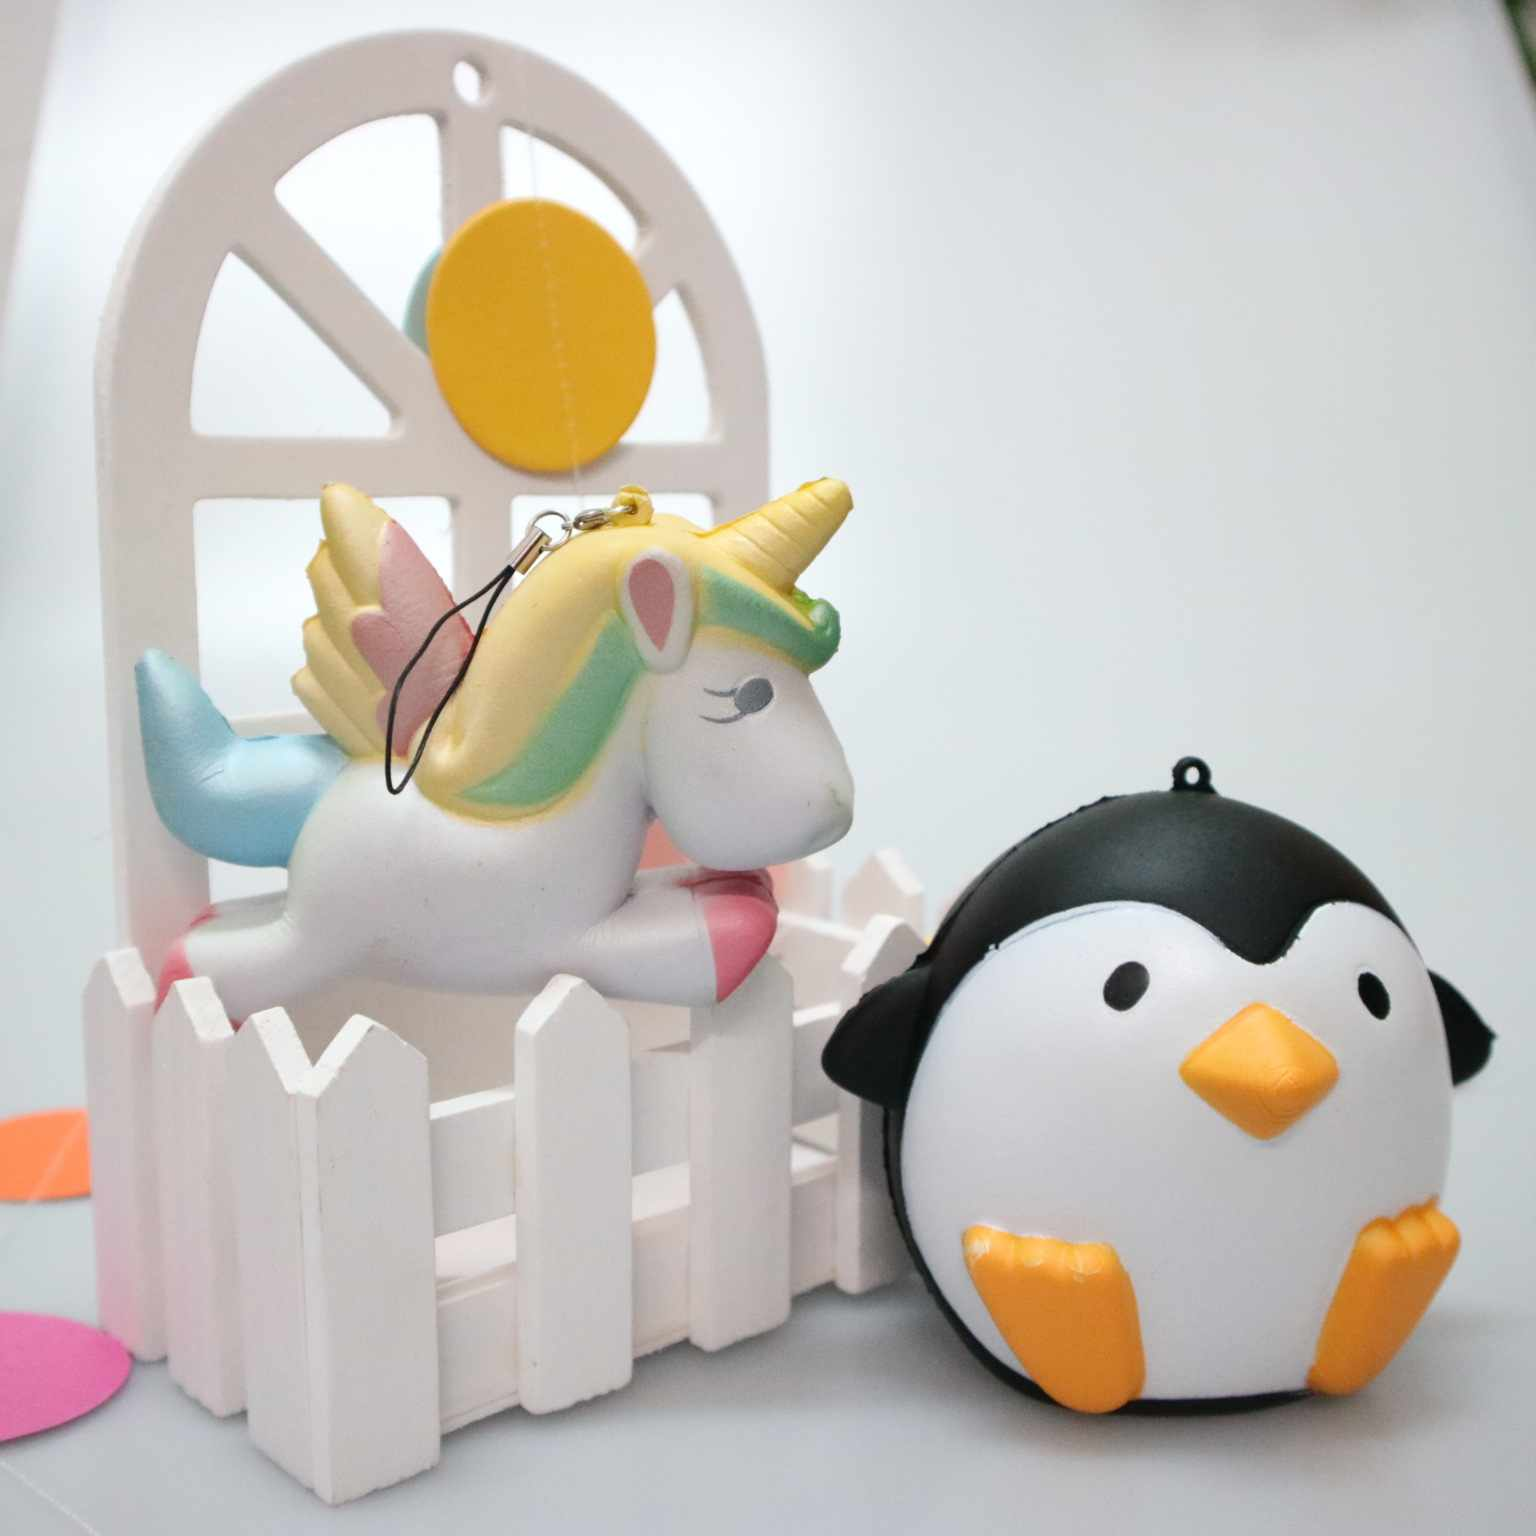 Kawaii Mole Anti-stress Mini Bonito Pegasus Unicórnio Urso Panda Sapo Aperto Aumento Lento Rebote Suave Boneca Brinquedos Para Crianças presente